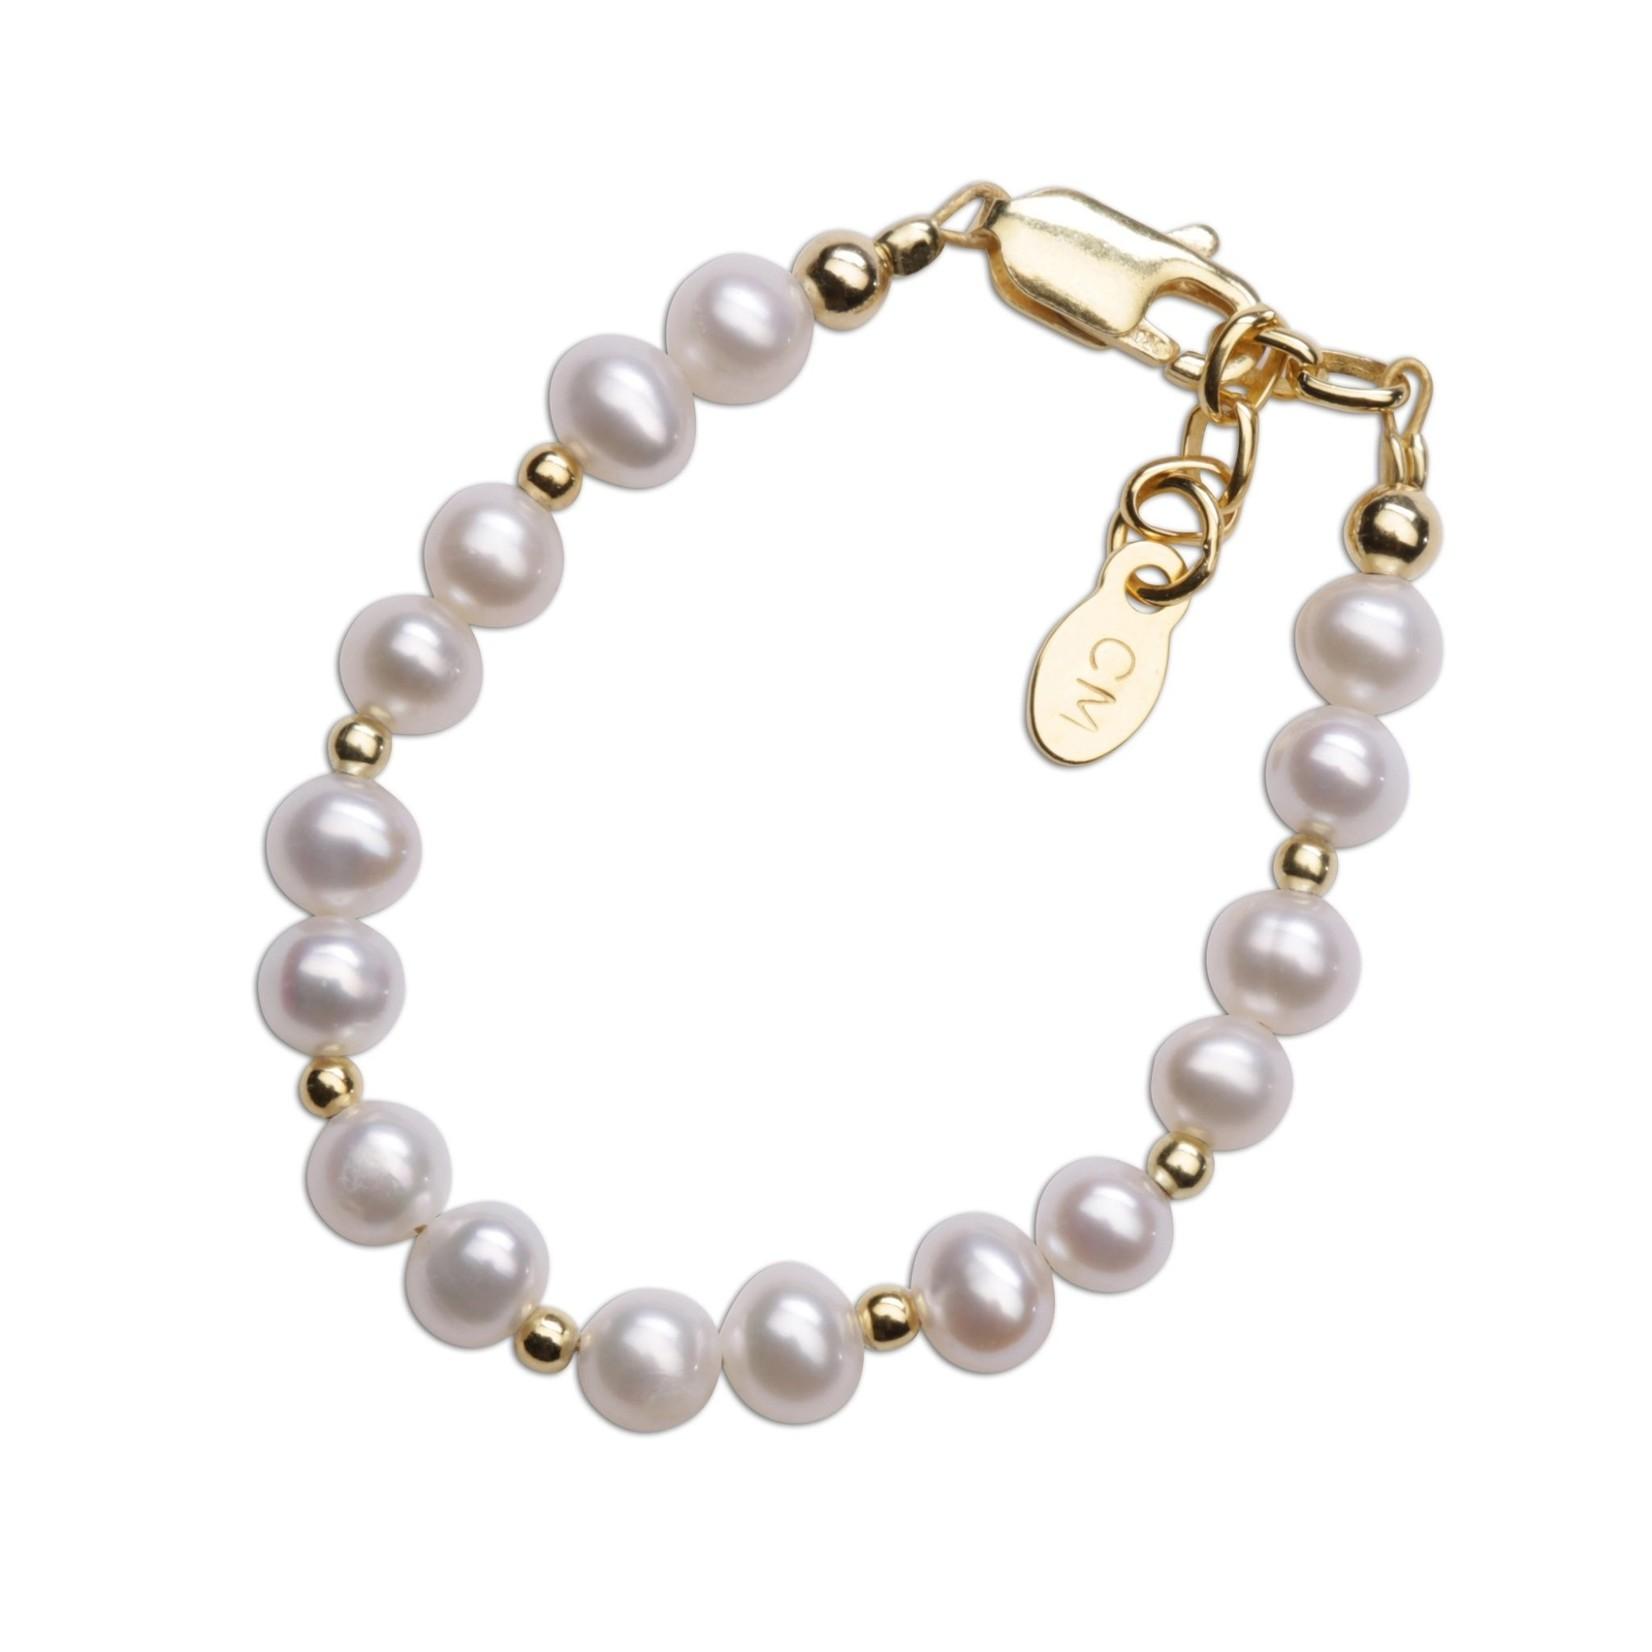 Cherished Moments Brynn - SM - 14K Gold Plated Pearl Baby Baptism Bracelet